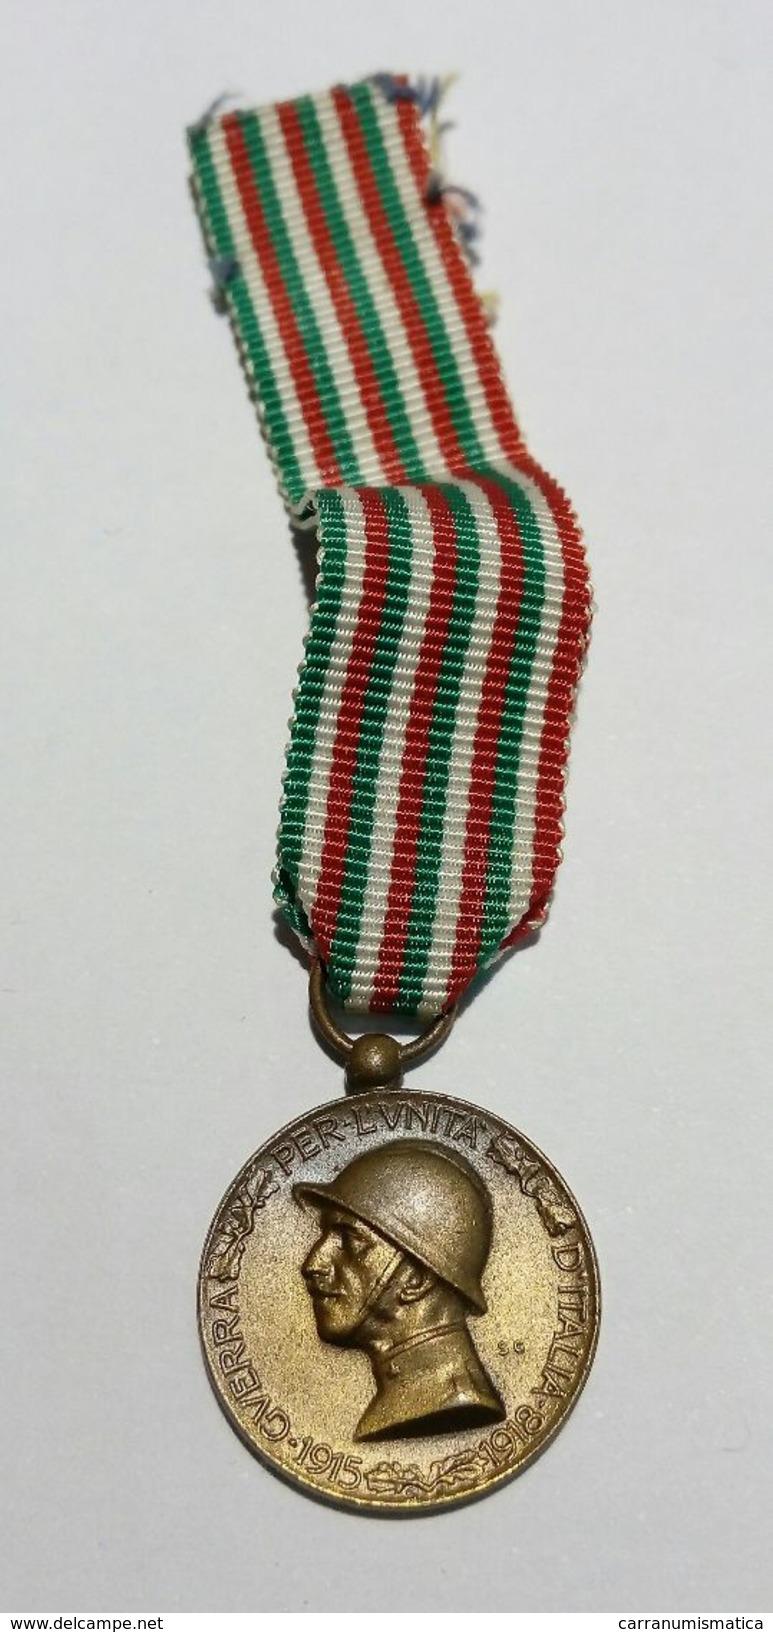 WWI - MEDAGLIA MIGNON - GUERRA ITALO - AUSTRIACA (1915-1918) Bronzo Nemico / Nastro Originale - Italia